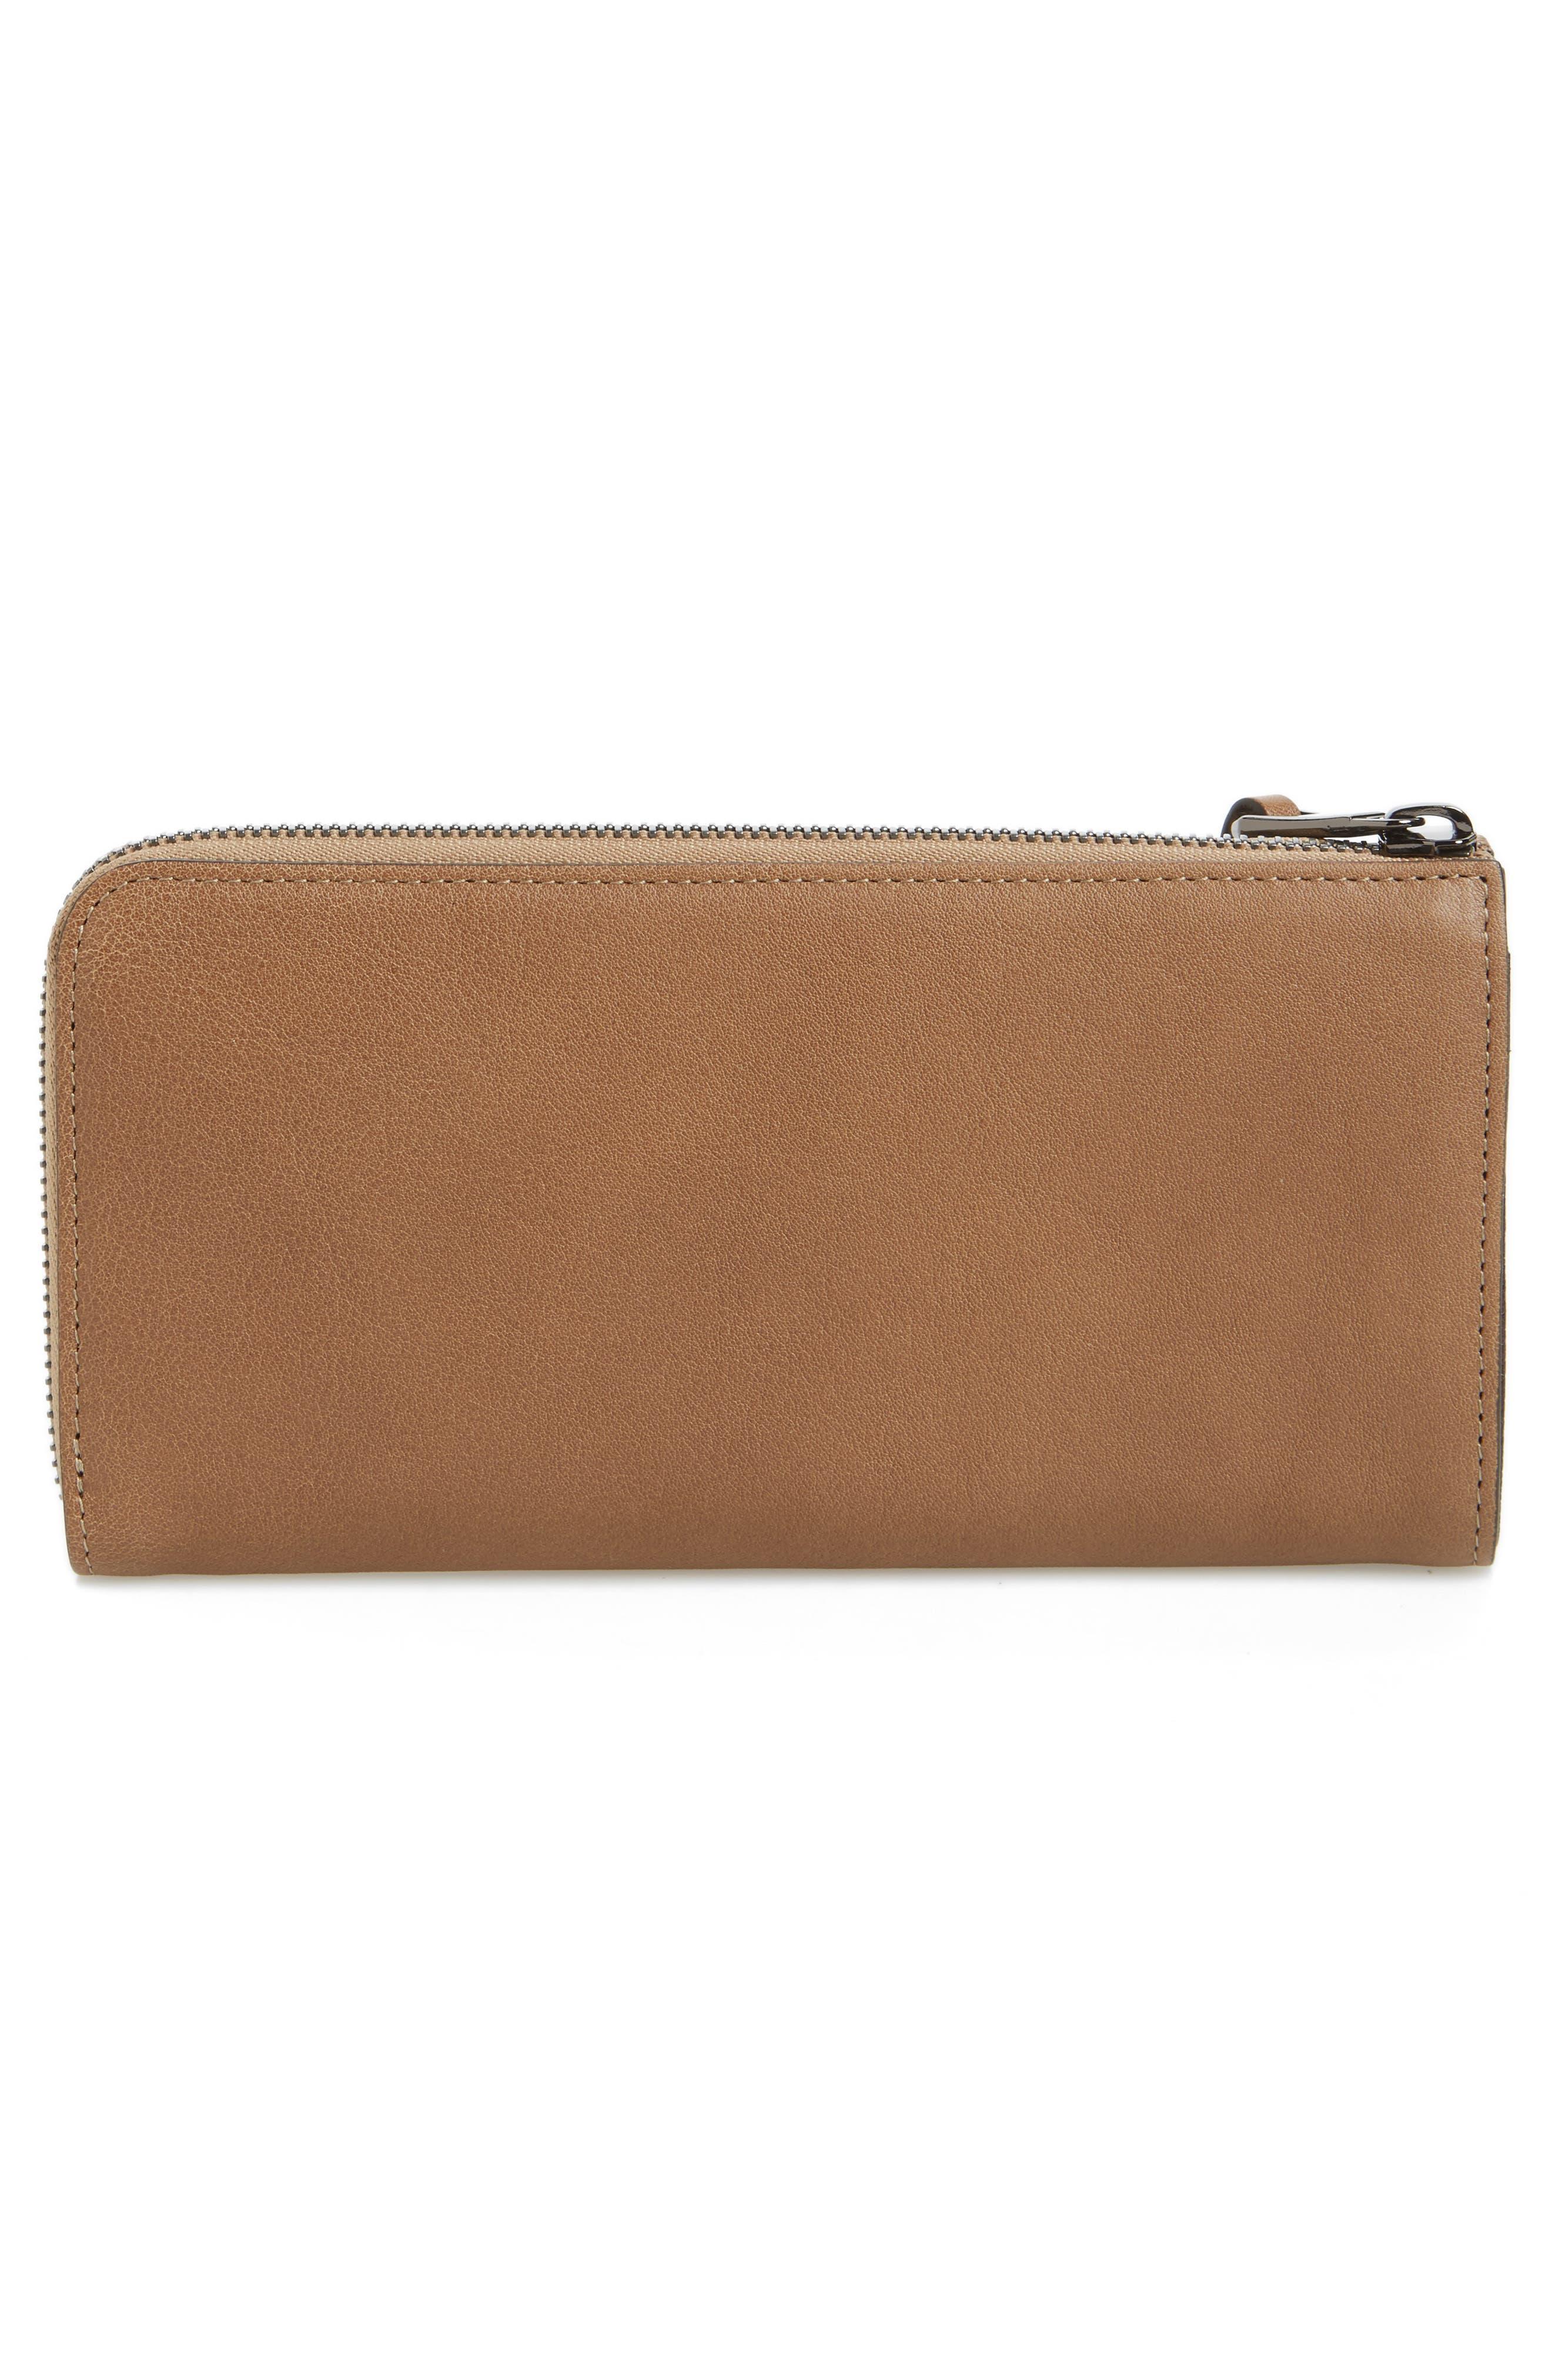 3D Leather Wallet,                             Alternate thumbnail 3, color,                             250